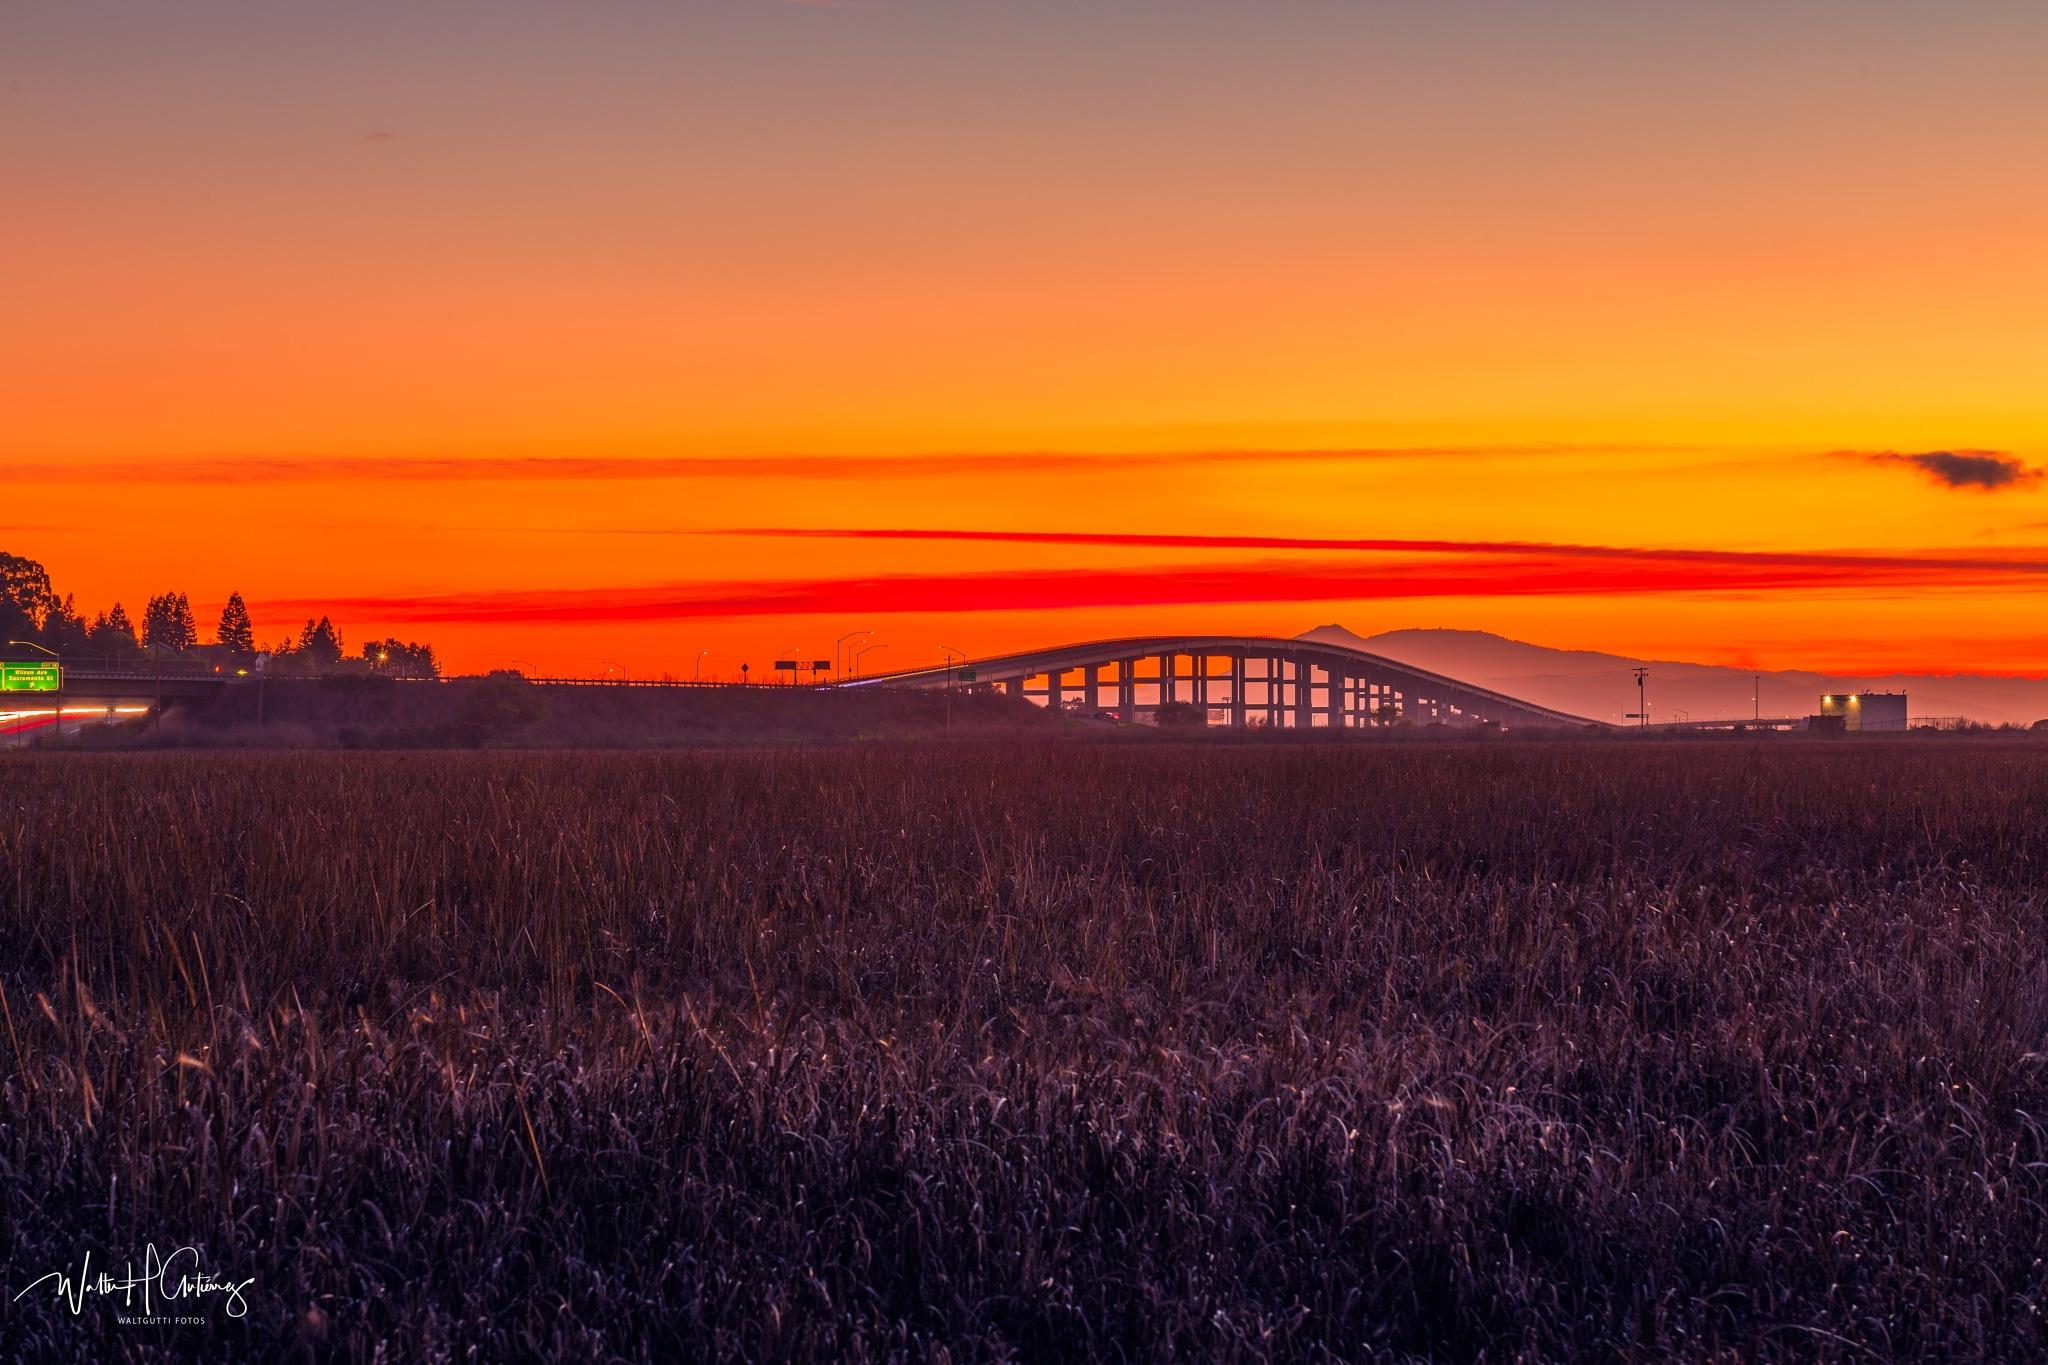 Photo in Landscape #sunset #napa river bridge #bridge #bridges #vallejo #ca #california #bay area #monsters at the end of the hig #monsters #landscape #longexposure #lifestyle #orange #cars #trees #nature #picoftheday